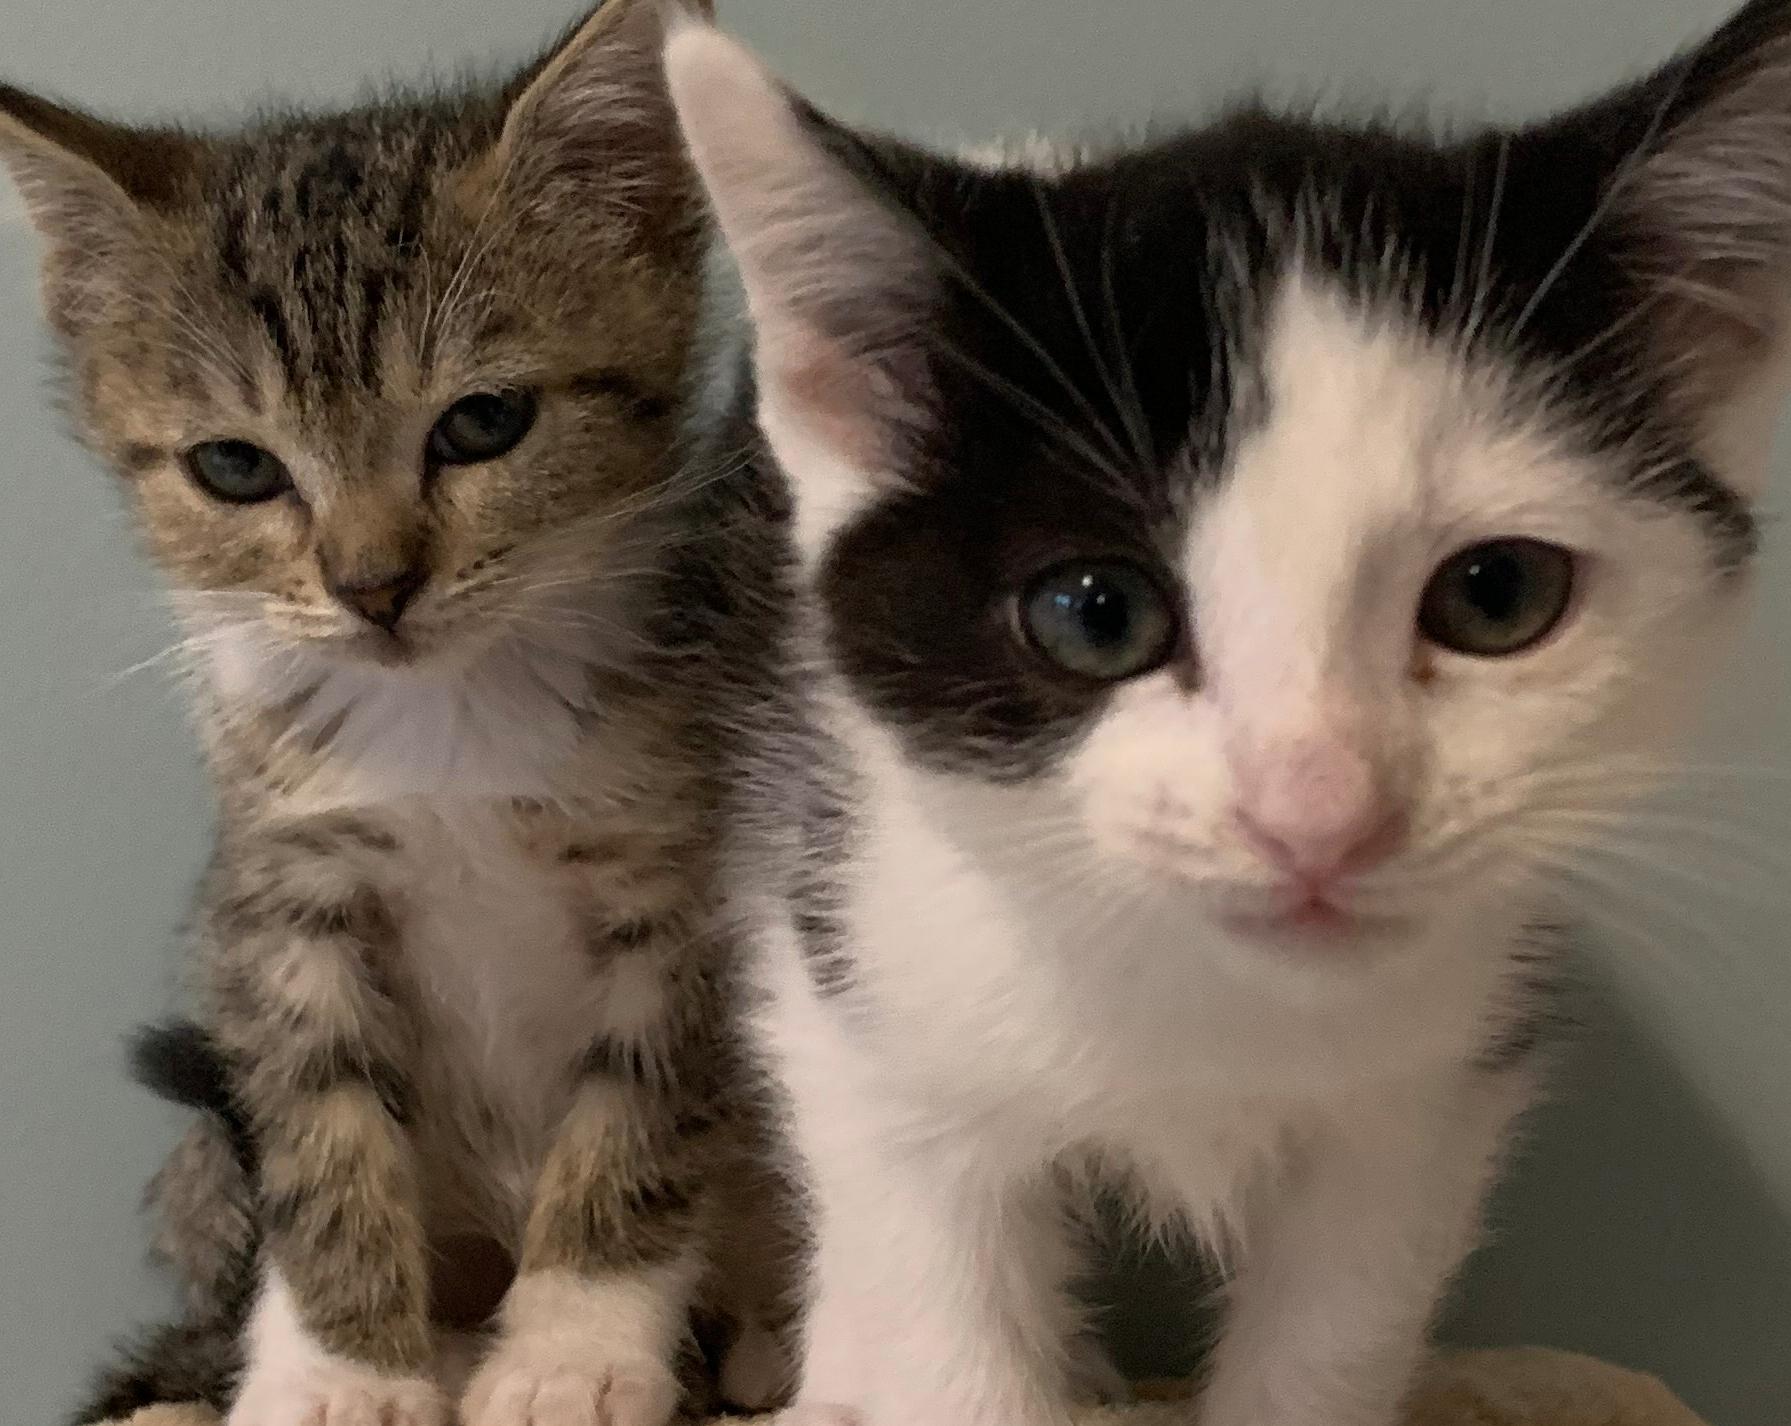 adotar gatos na irlanda, adotar pets na irlanda, adotar gatos em dublin